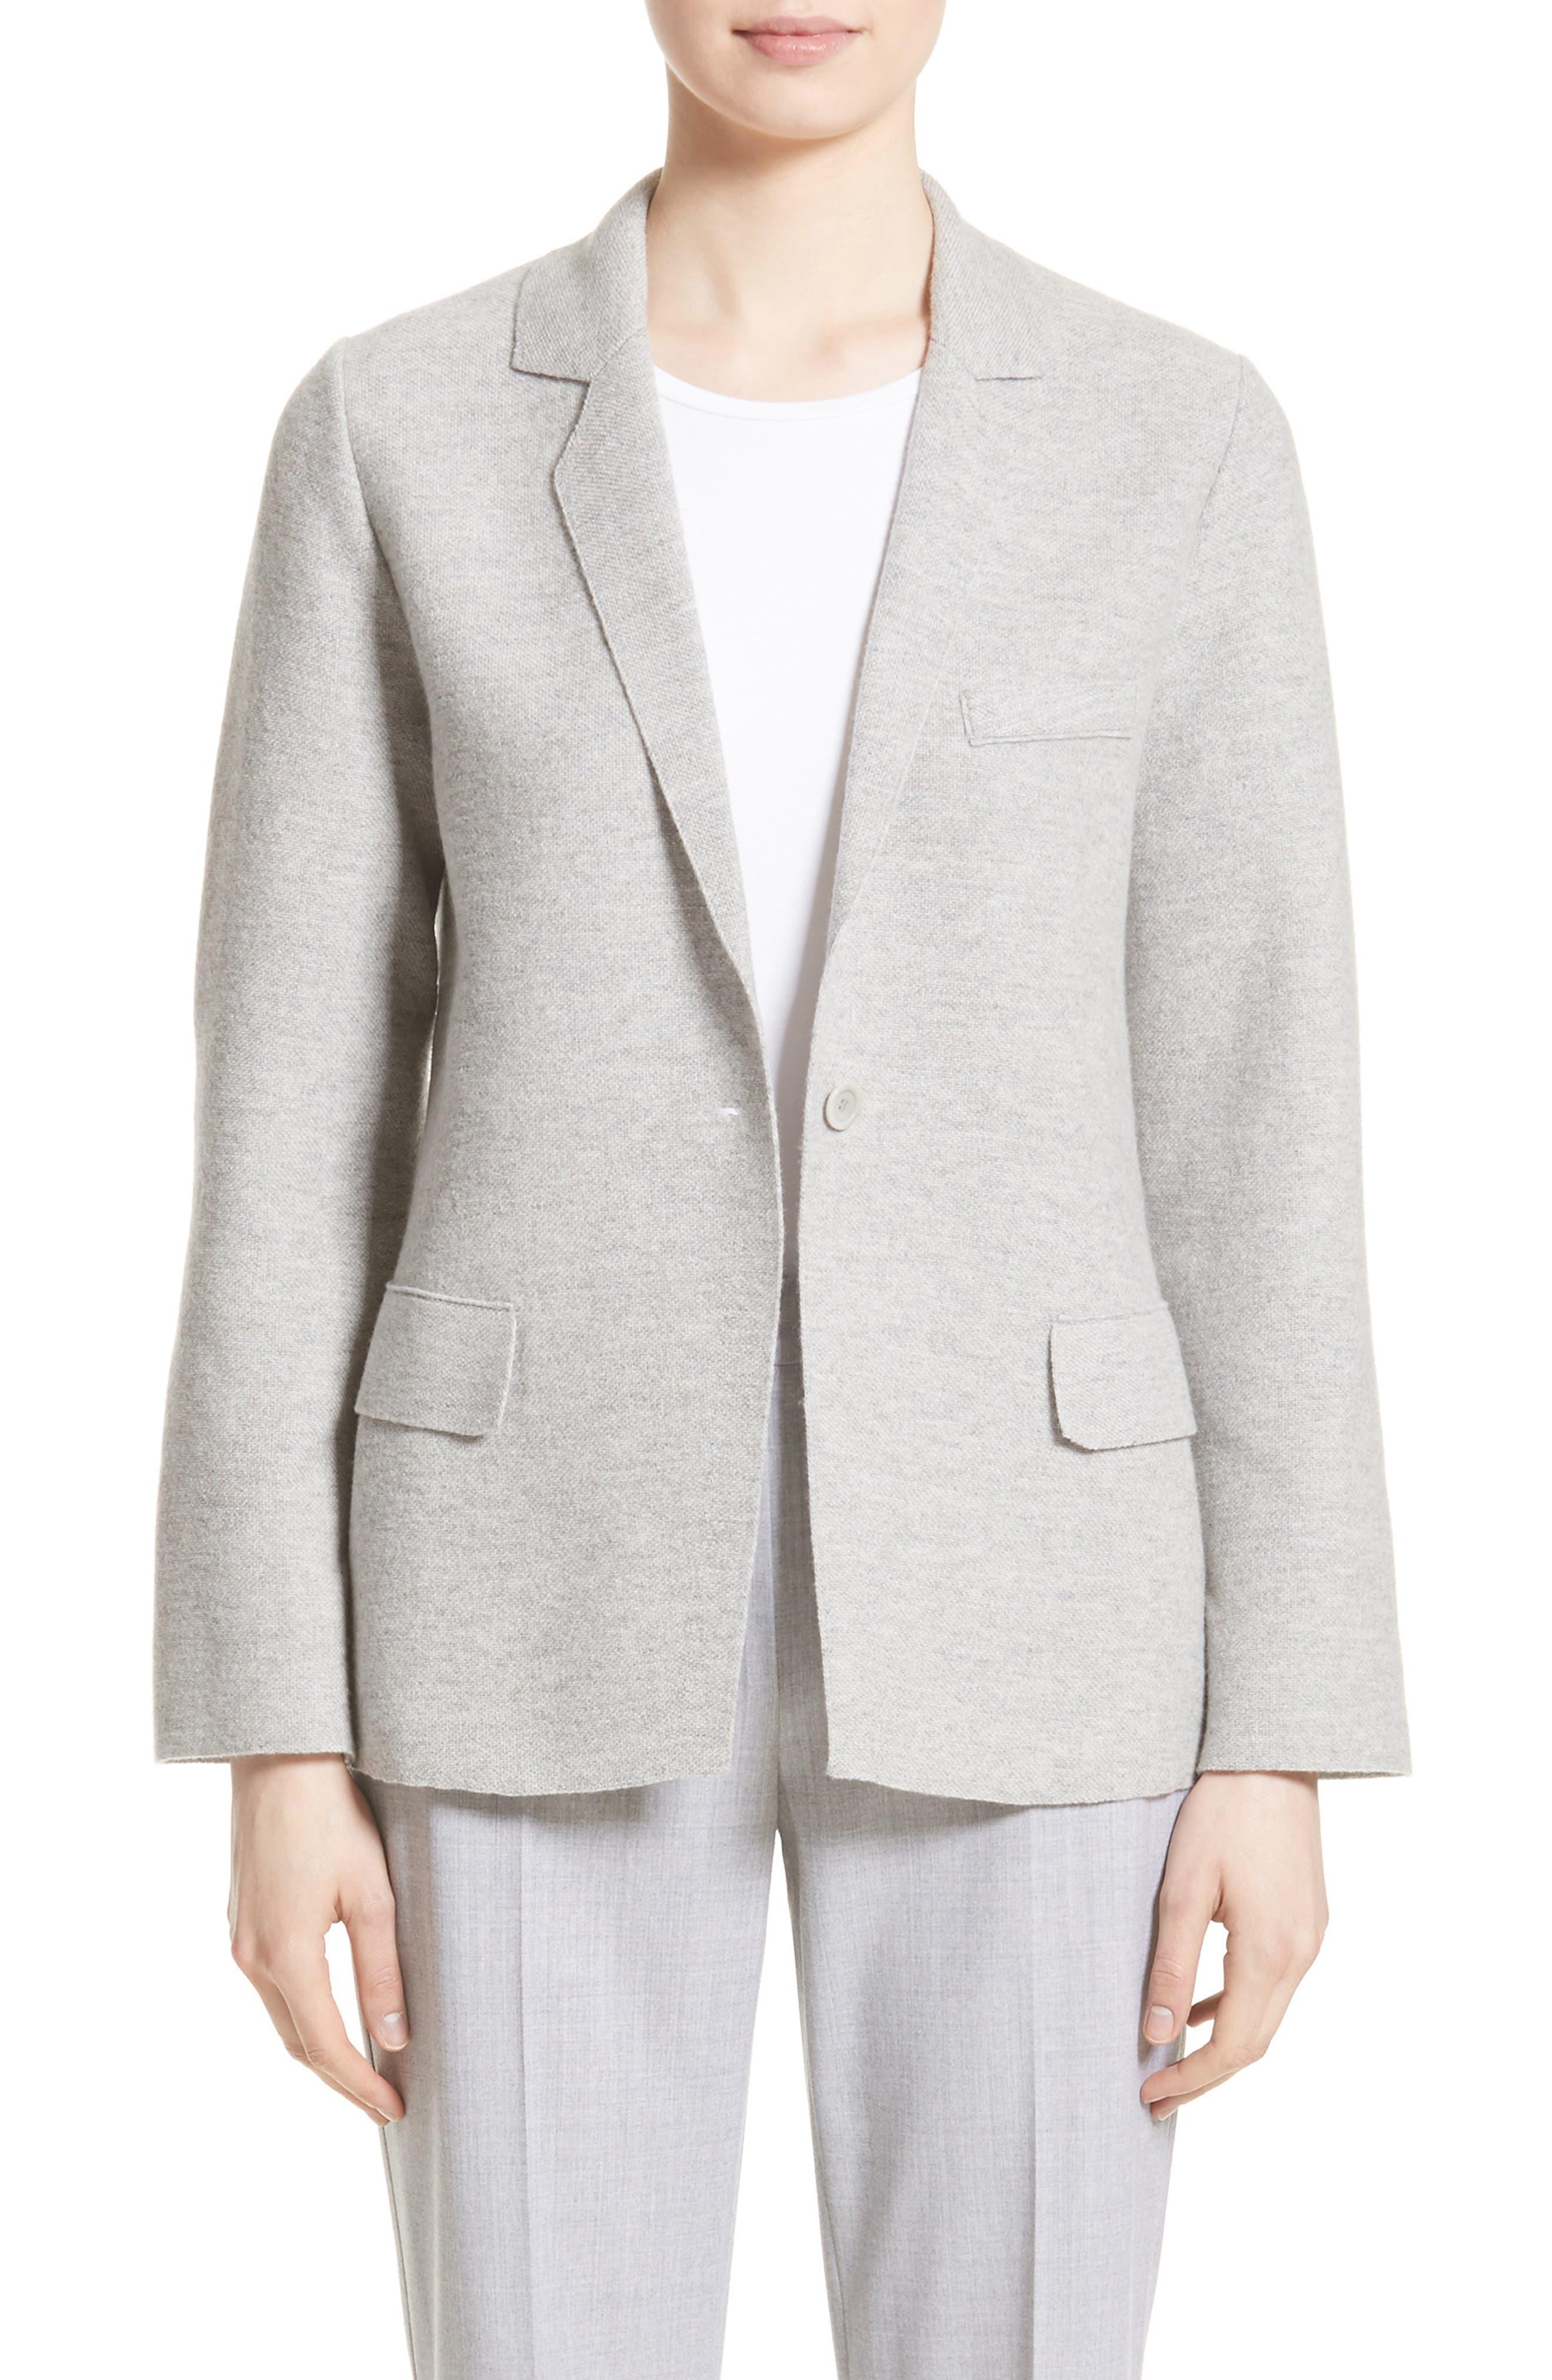 Main Image - Max Mara Segnale Cashmere Jacket